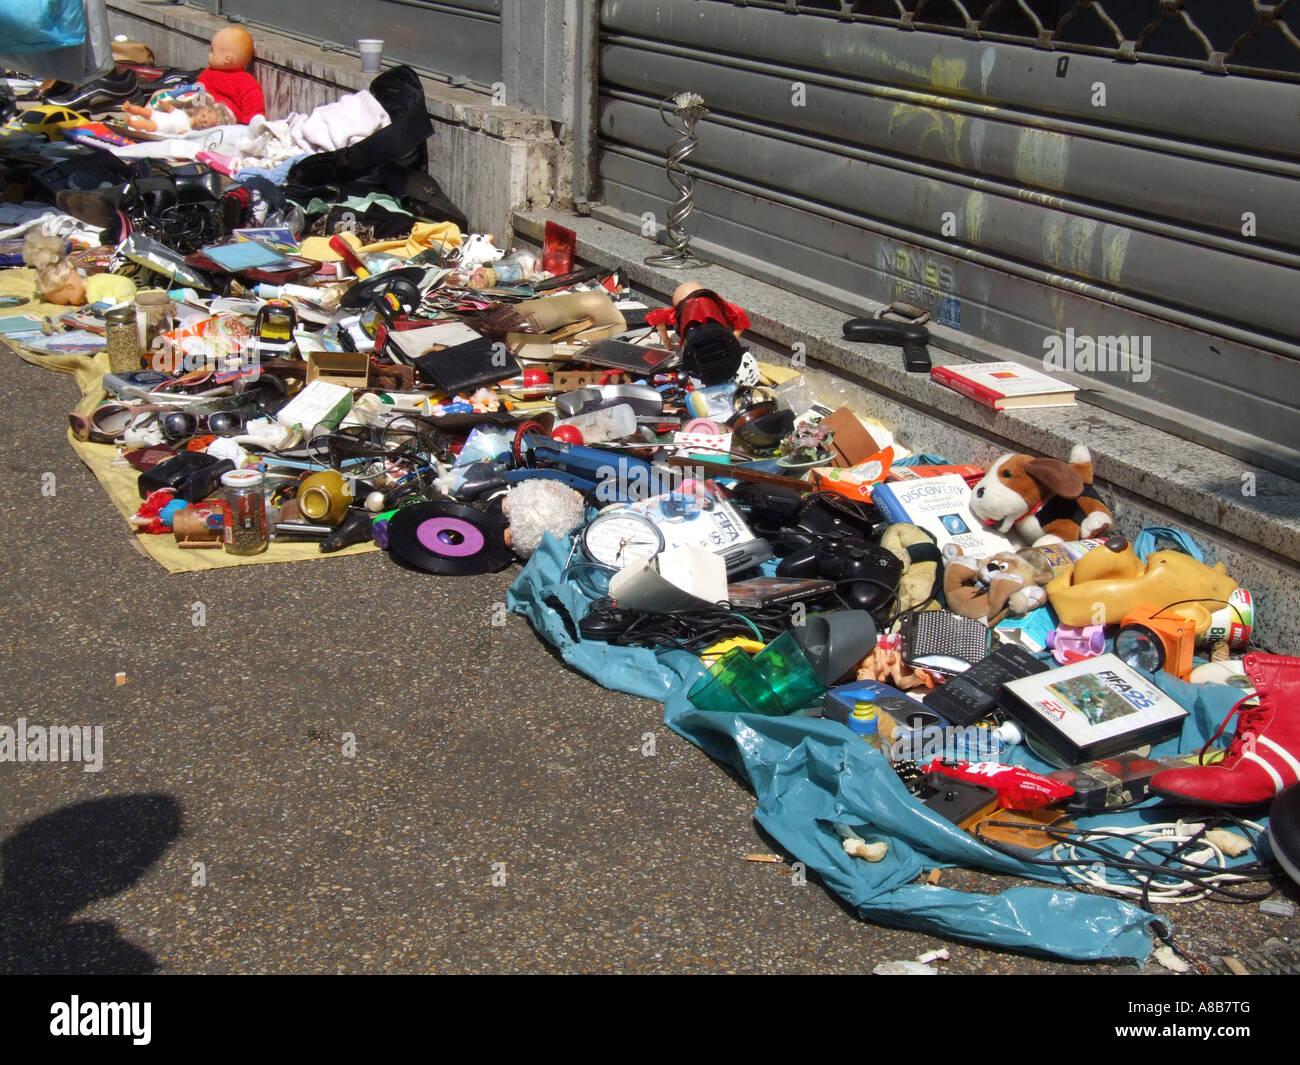 Goods Old Sale Ground Floor Rubbish Trash Junk Car Boot Stock Photos ...